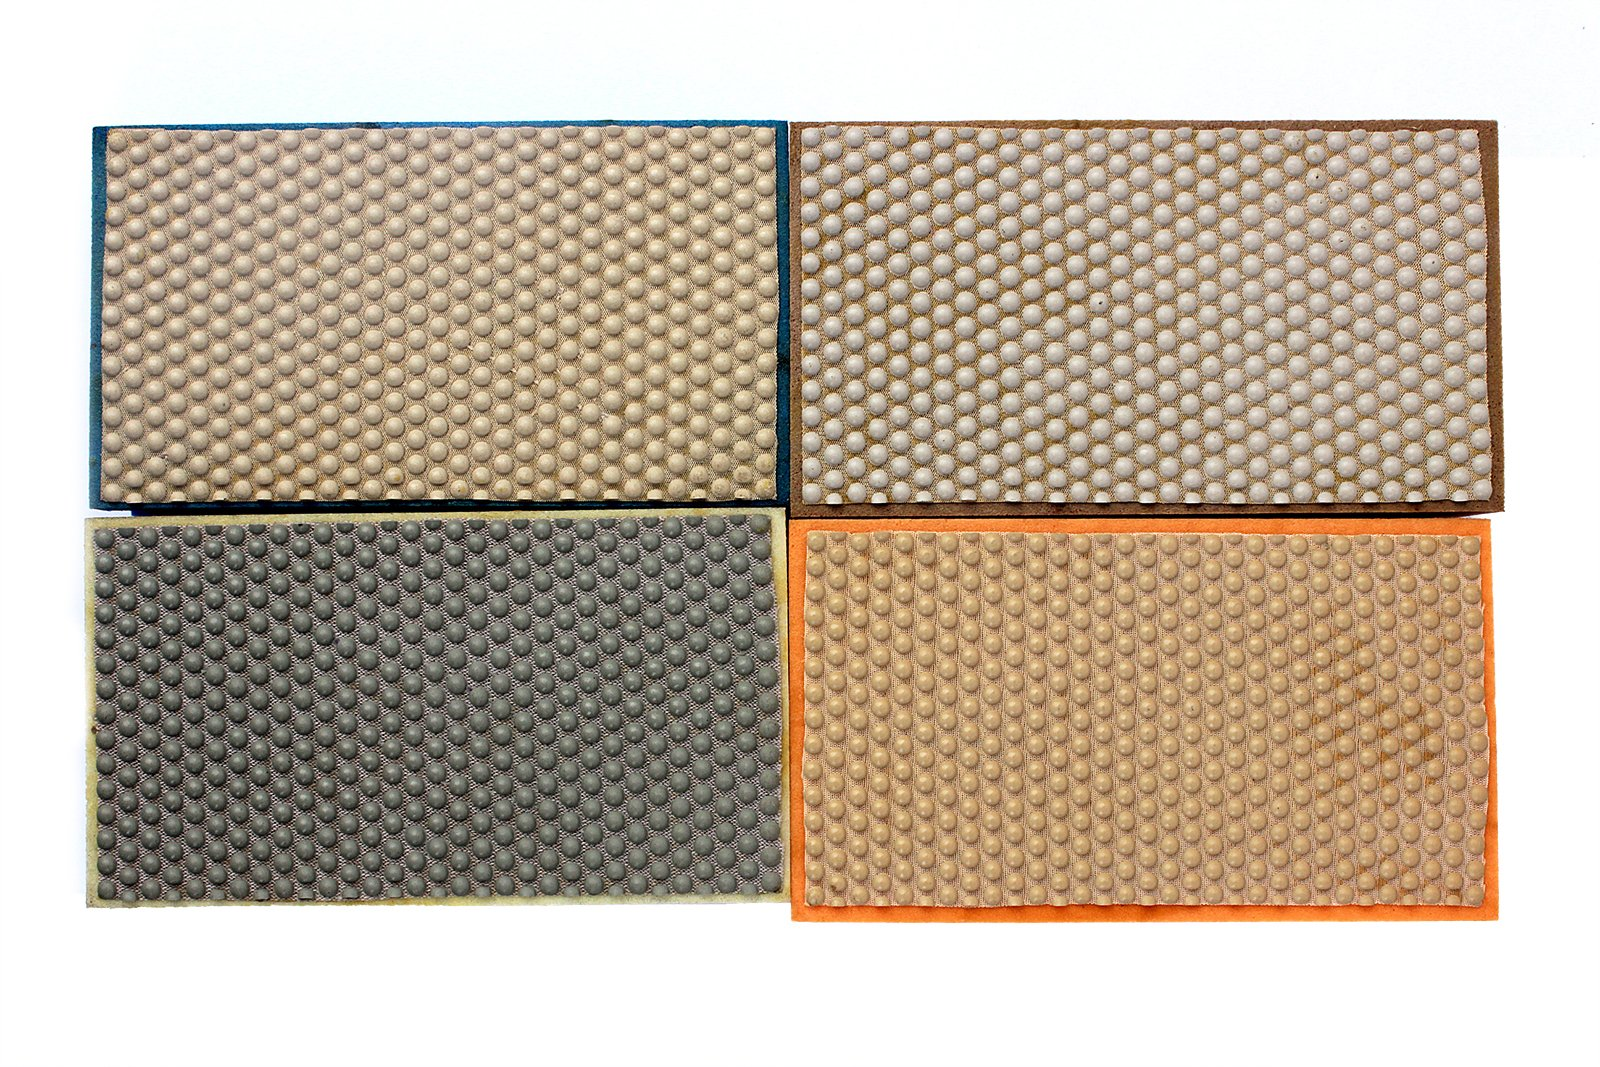 Z-Lion Resin Diamond Hand Sanding Pads for Stone Glass Ceramic Marble Granite,Set of 4 Pcs by Z-LION (Image #3)